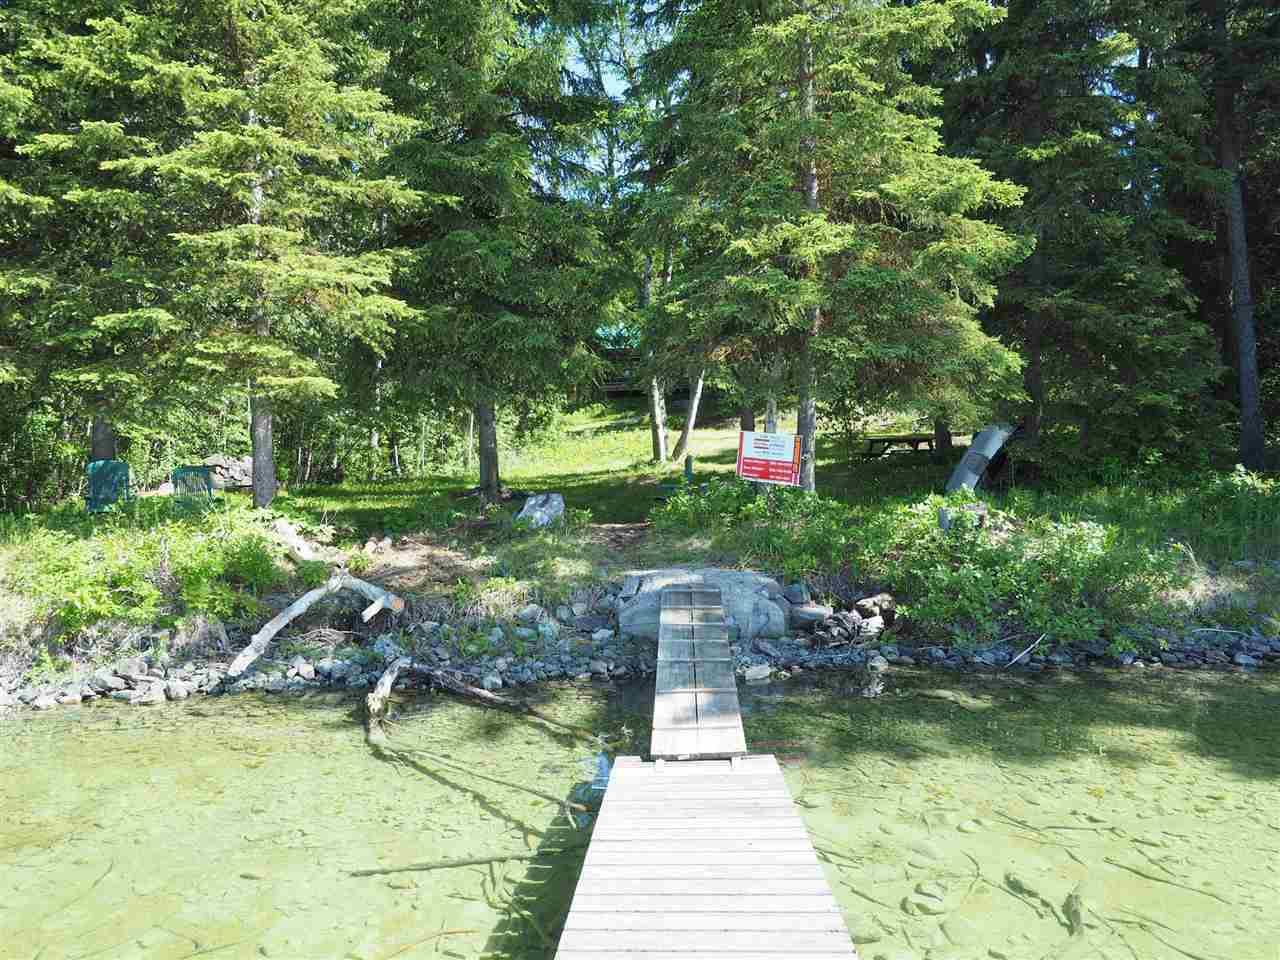 Photo 21: Photos: 8222 CENTENNIAL Road in Bridge Lake: Bridge Lake/Sheridan Lake House for sale (100 Mile House (Zone 10))  : MLS®# R2457362